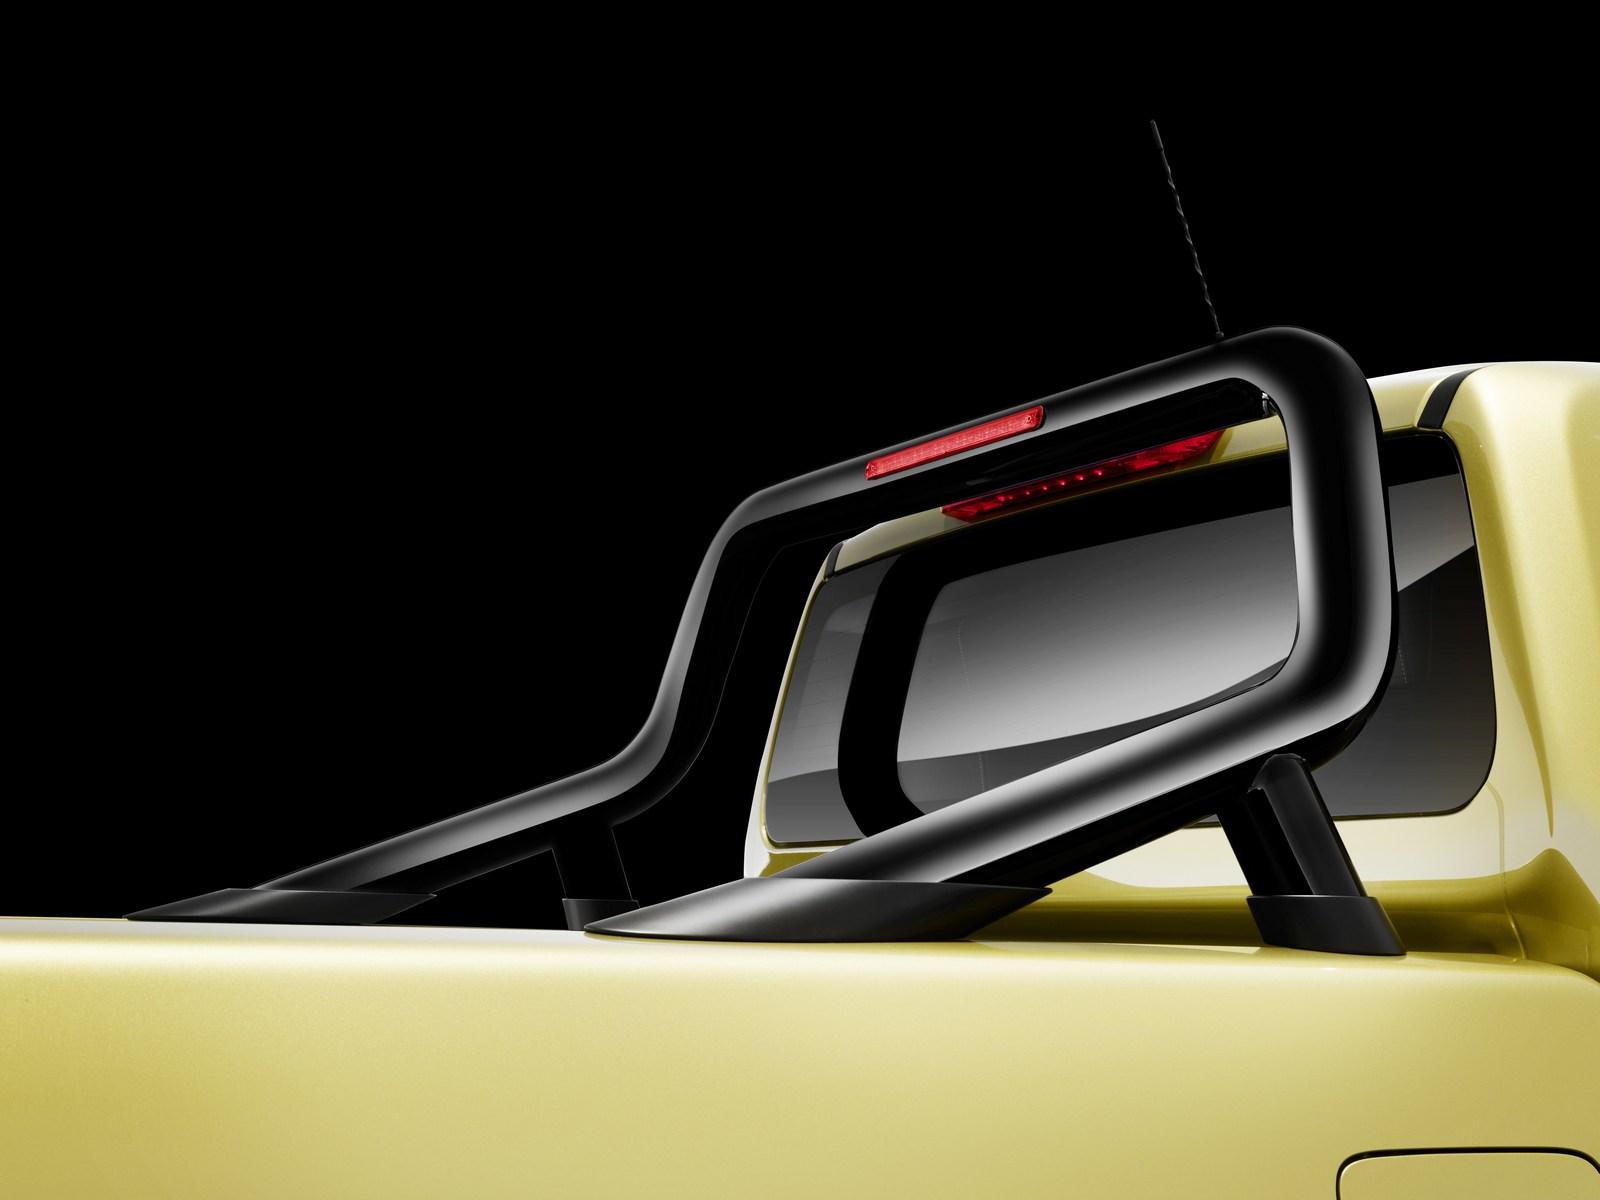 Mercedes-Benz X-Klasse – Styling Bar (Mercedes-Benz Zubehör) Mercedes-Benz X-Class – Styling bar (Mercedes-Benz accessories)